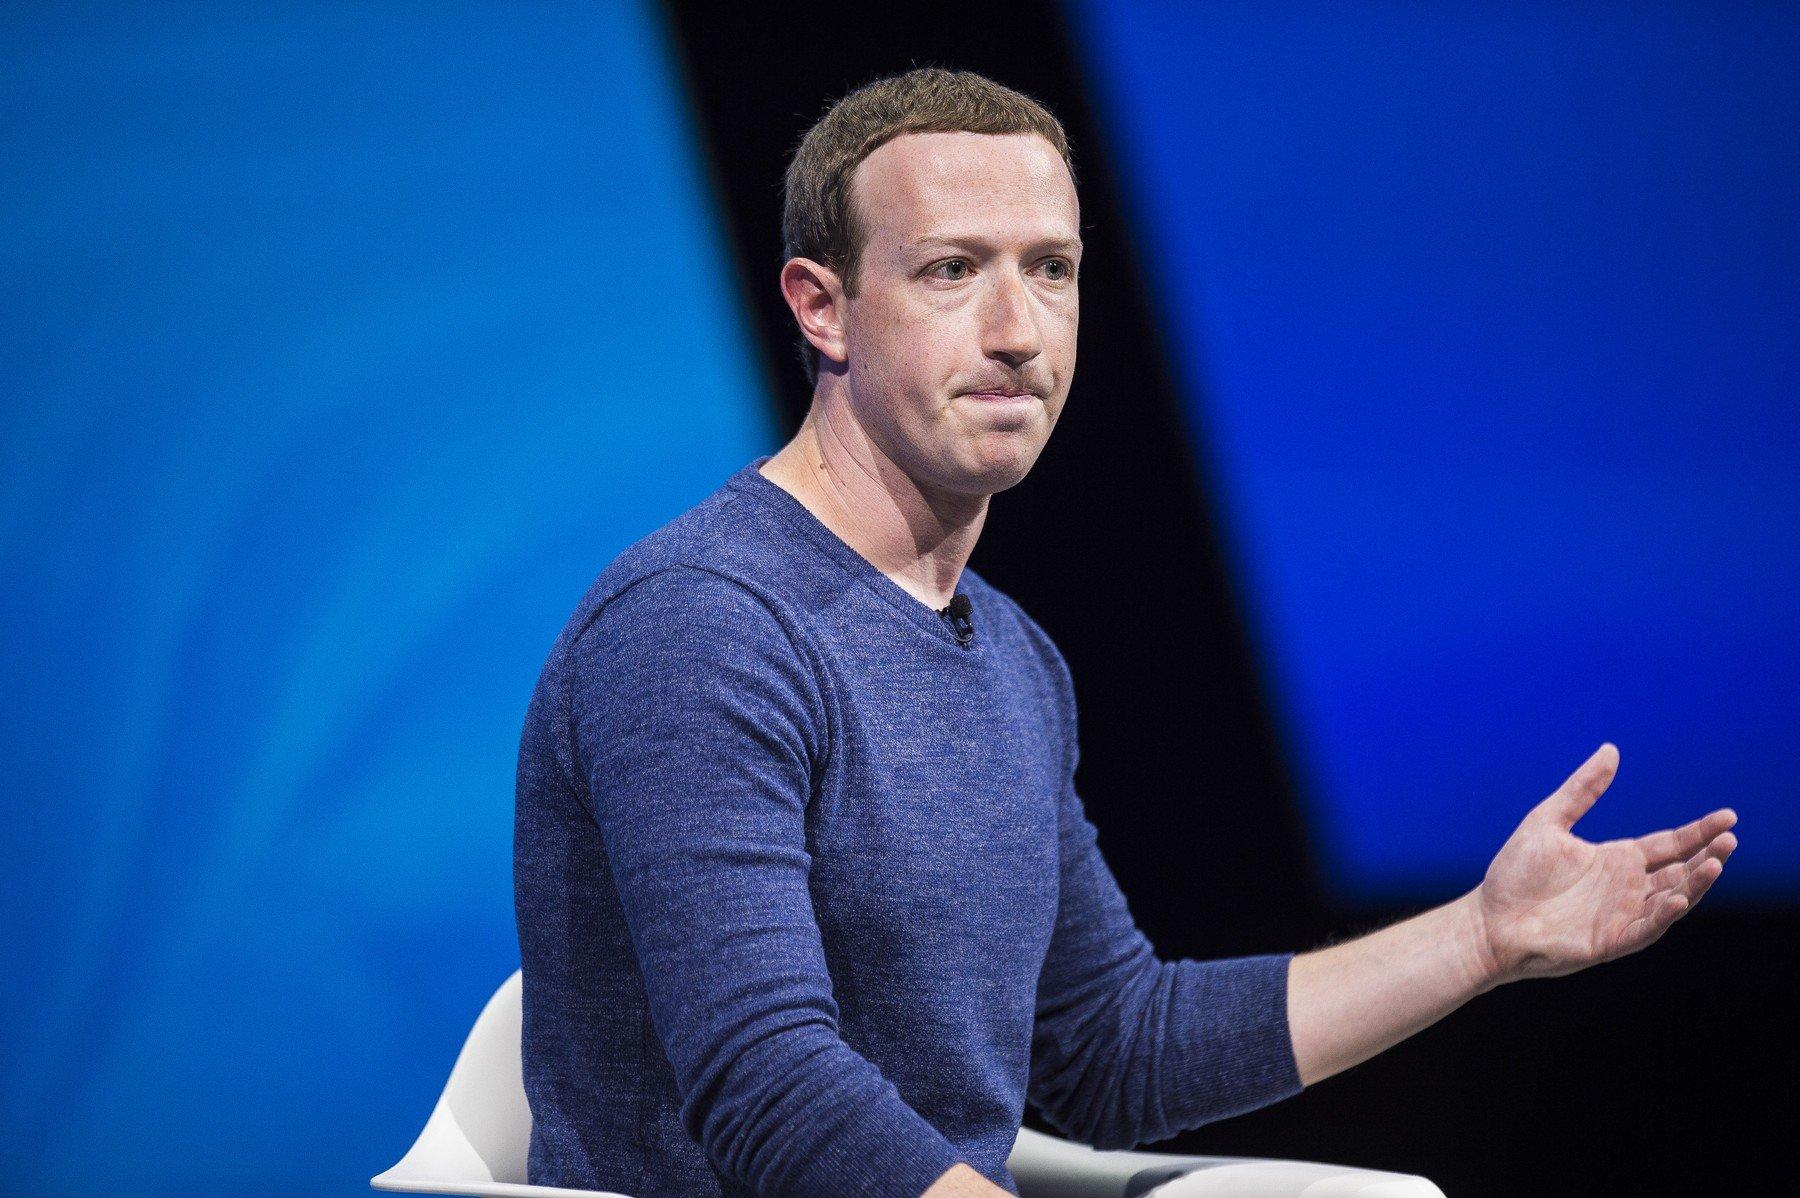 Izvršni direktor Facebooka Mark Zuckerberg